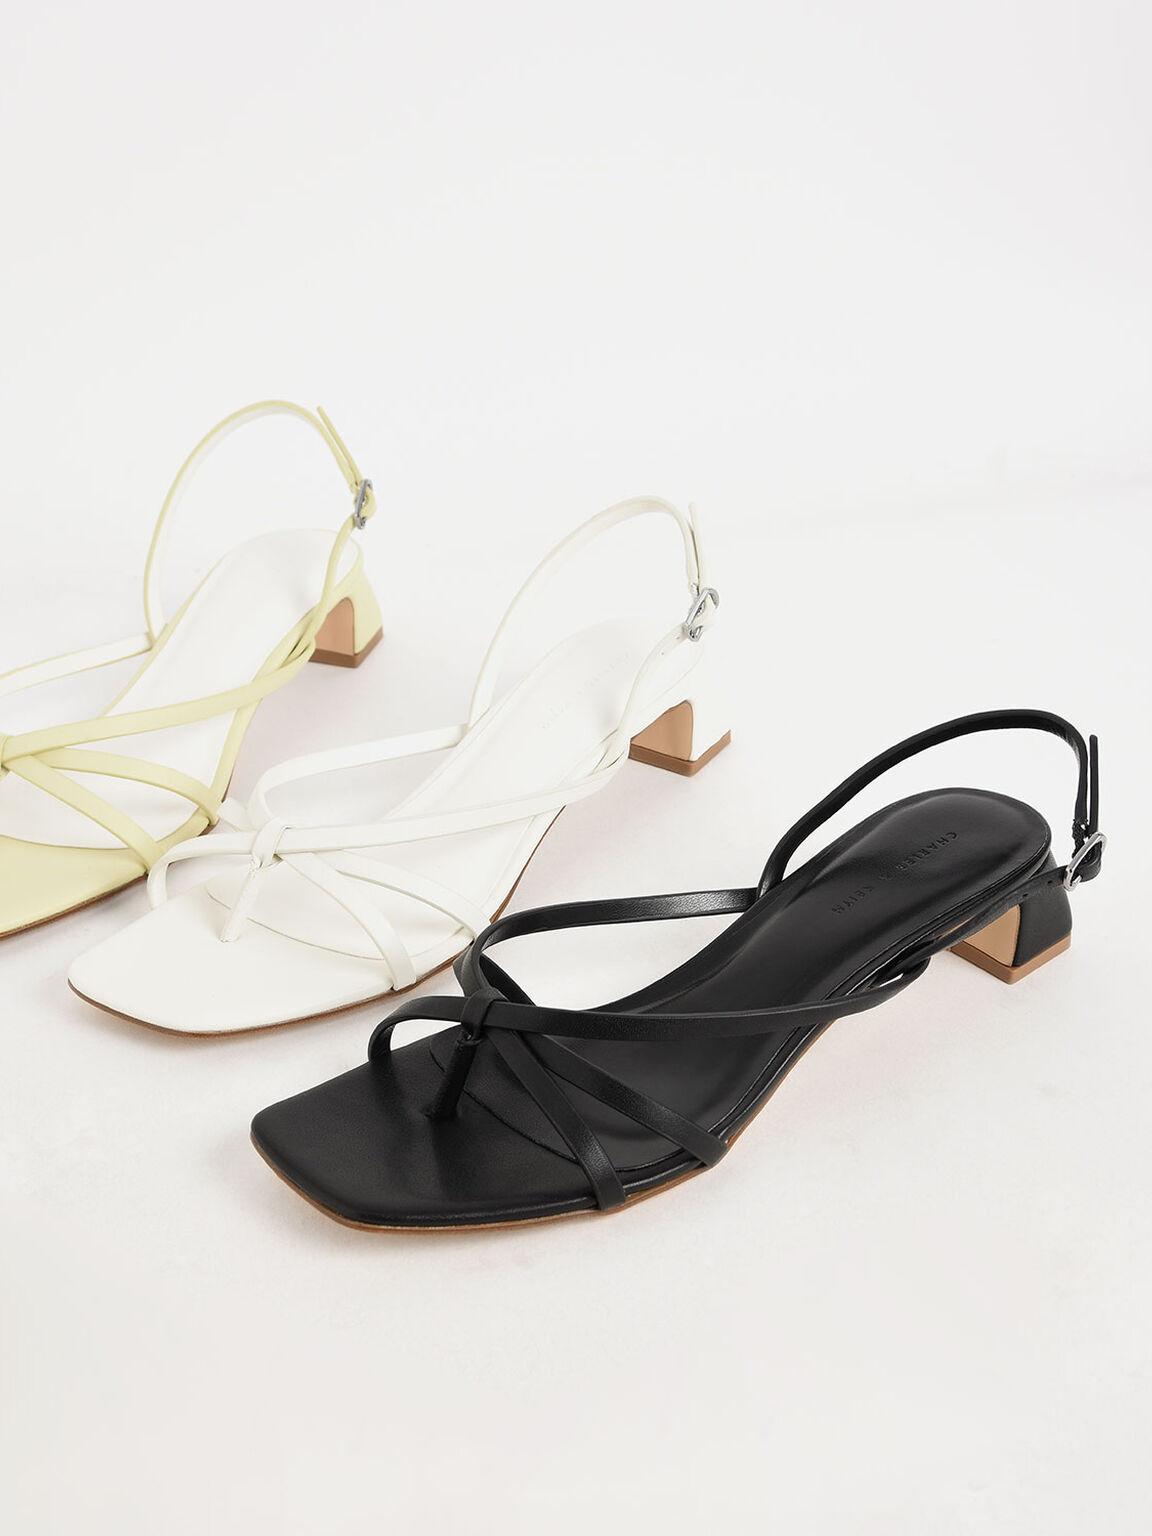 Strappy Sandals, Black, hi-res